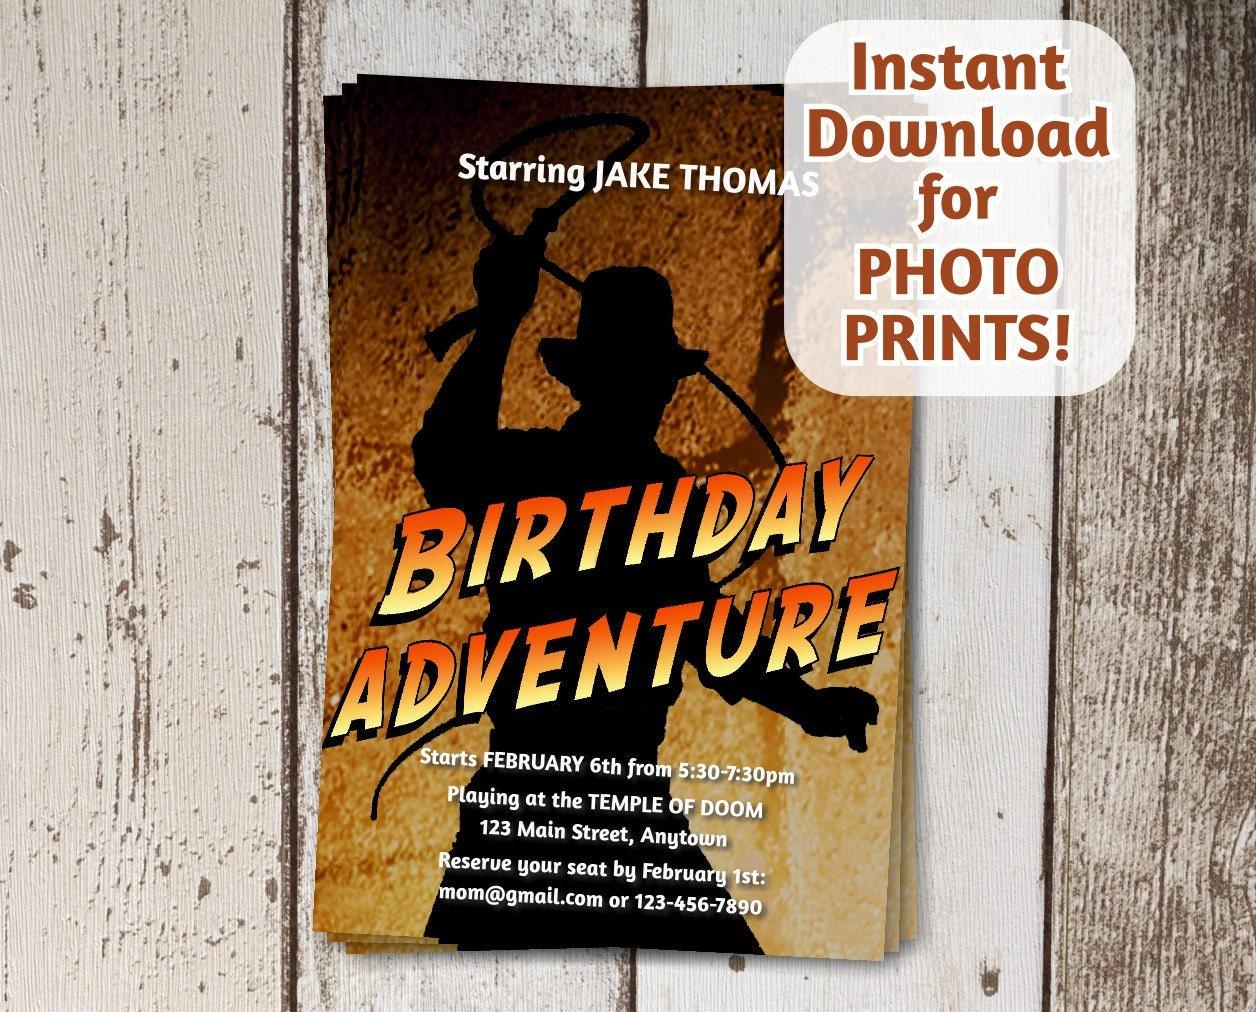 Indiana Jones Birthday Invitations Pictures To Pin On Pinterest